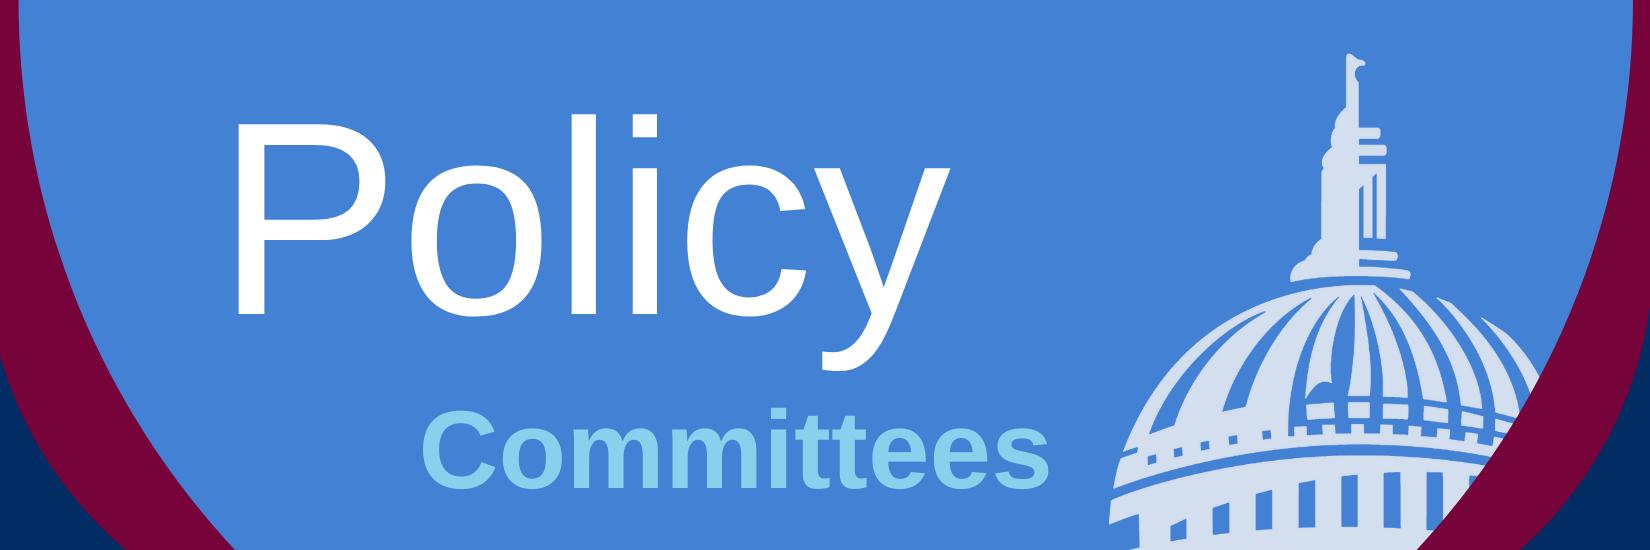 Committee-Policies.png